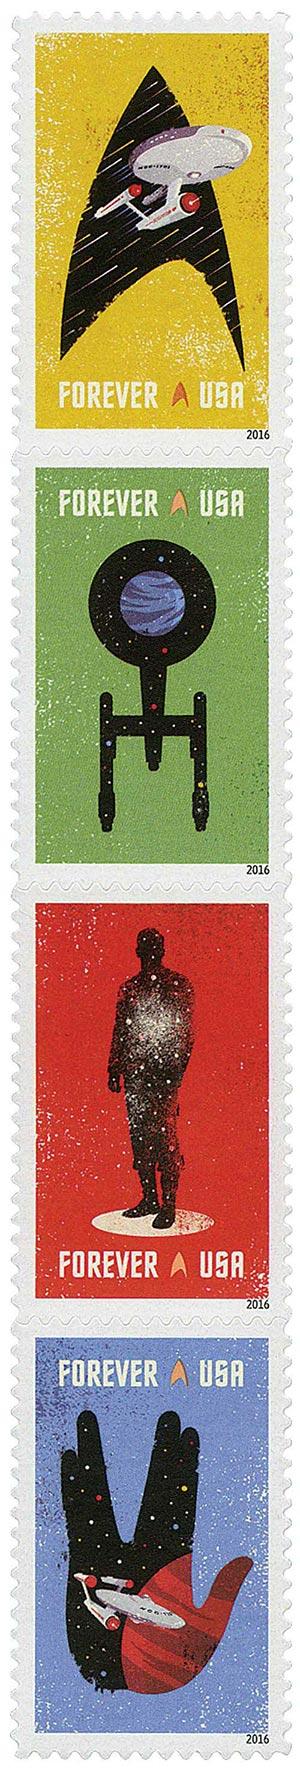 2016 First-Class Forever Stamp - Star Trek